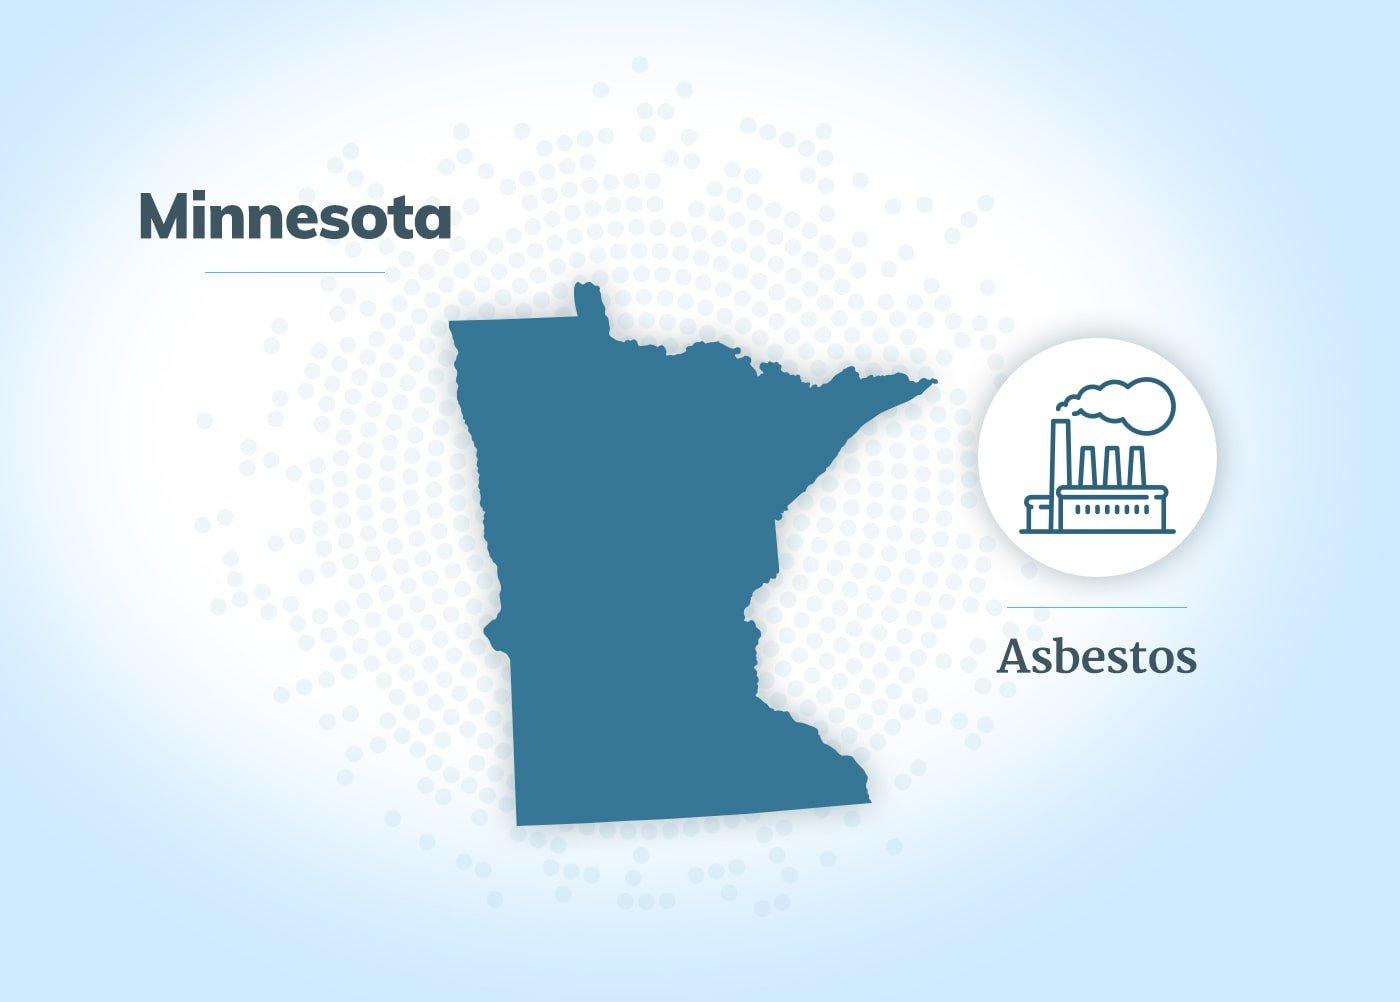 Asbestos exposure in Minnesota